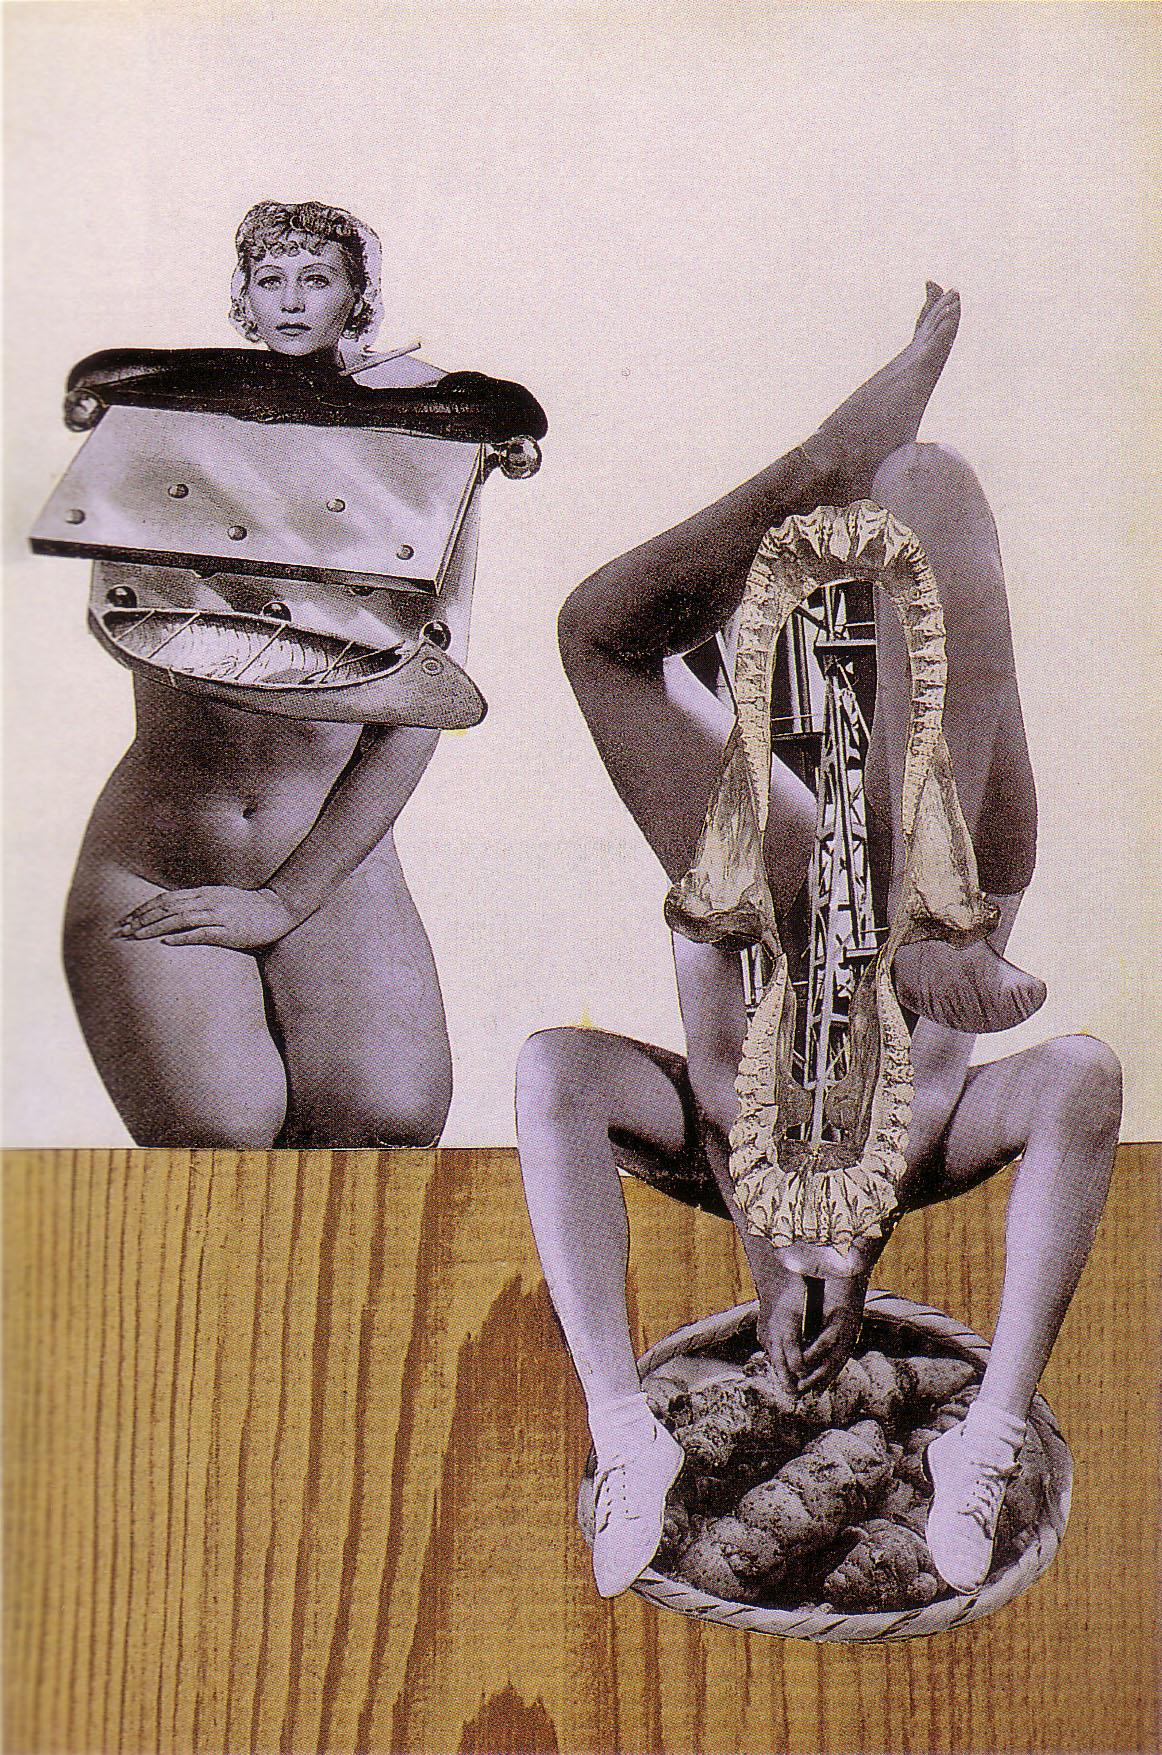 Karel Teige,- Collage #129, 1940. (c) Nachlass Karel Teige